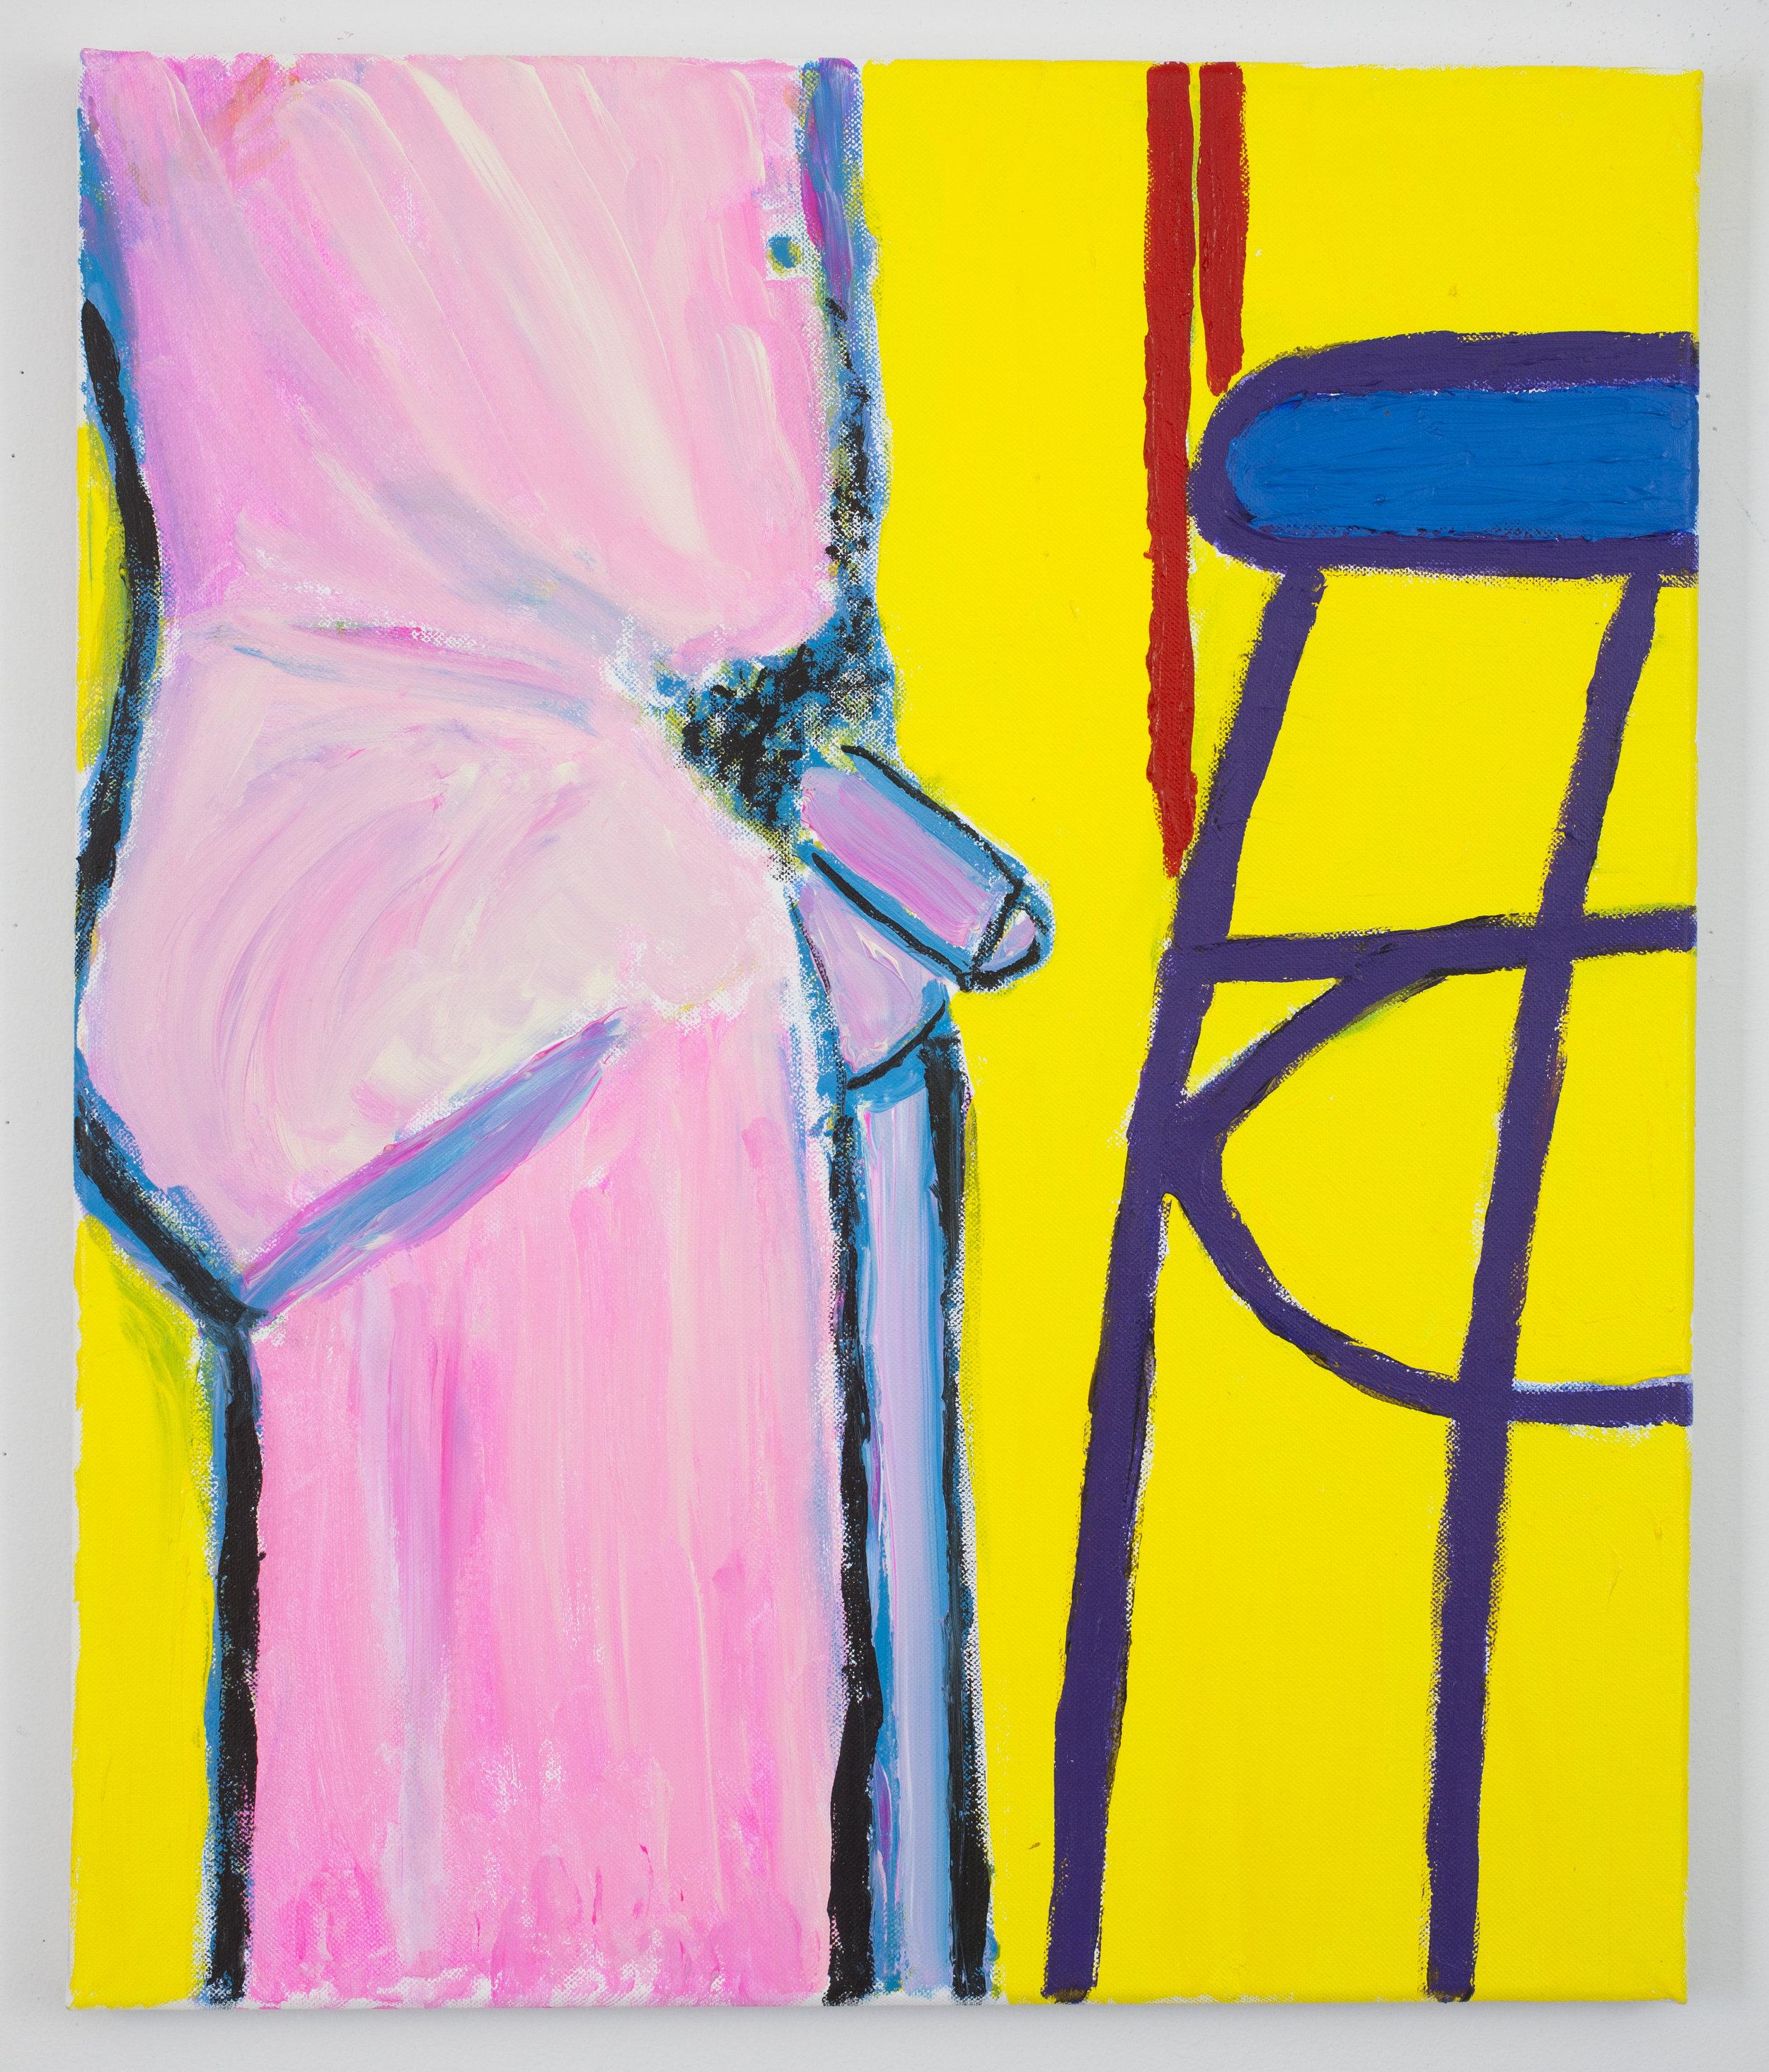 Nude Self-Portrait with Furniture  (2011)